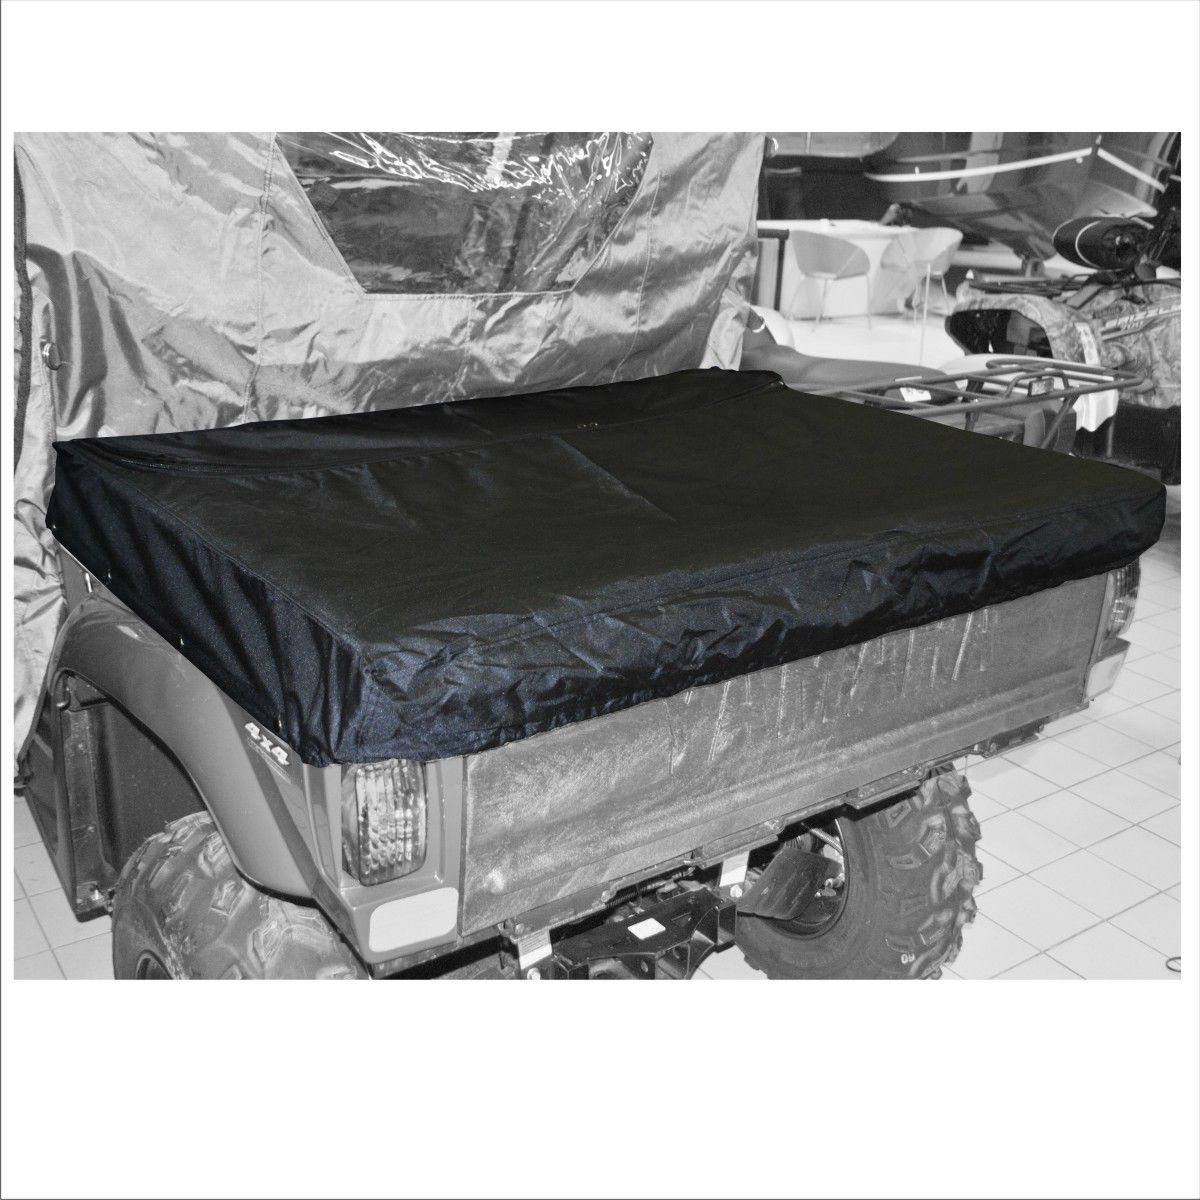 Тент AG-brand, на кузов UTV Yamaha Rhino 700, цвет: черный. AG-YAM-UTV-Rh700-CB